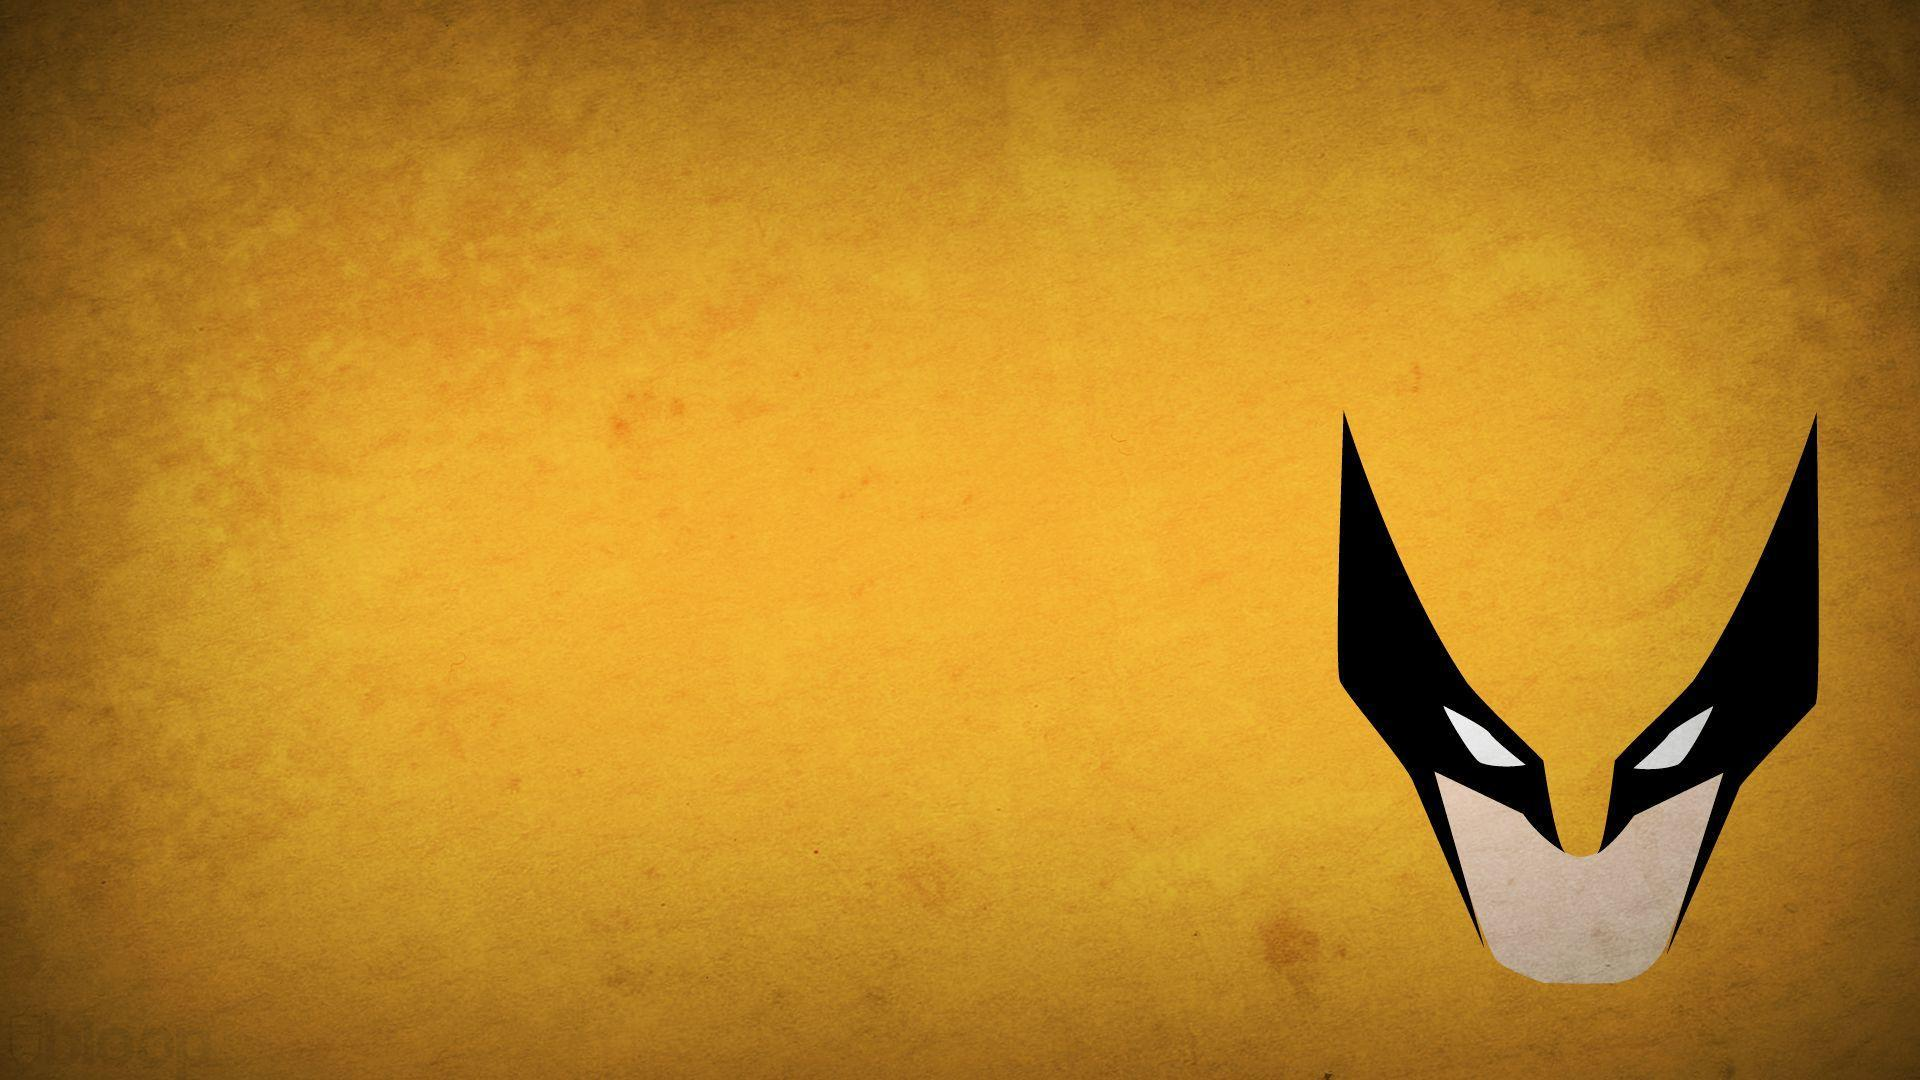 Simple Wolverine HD Wallpaper 1920x1080